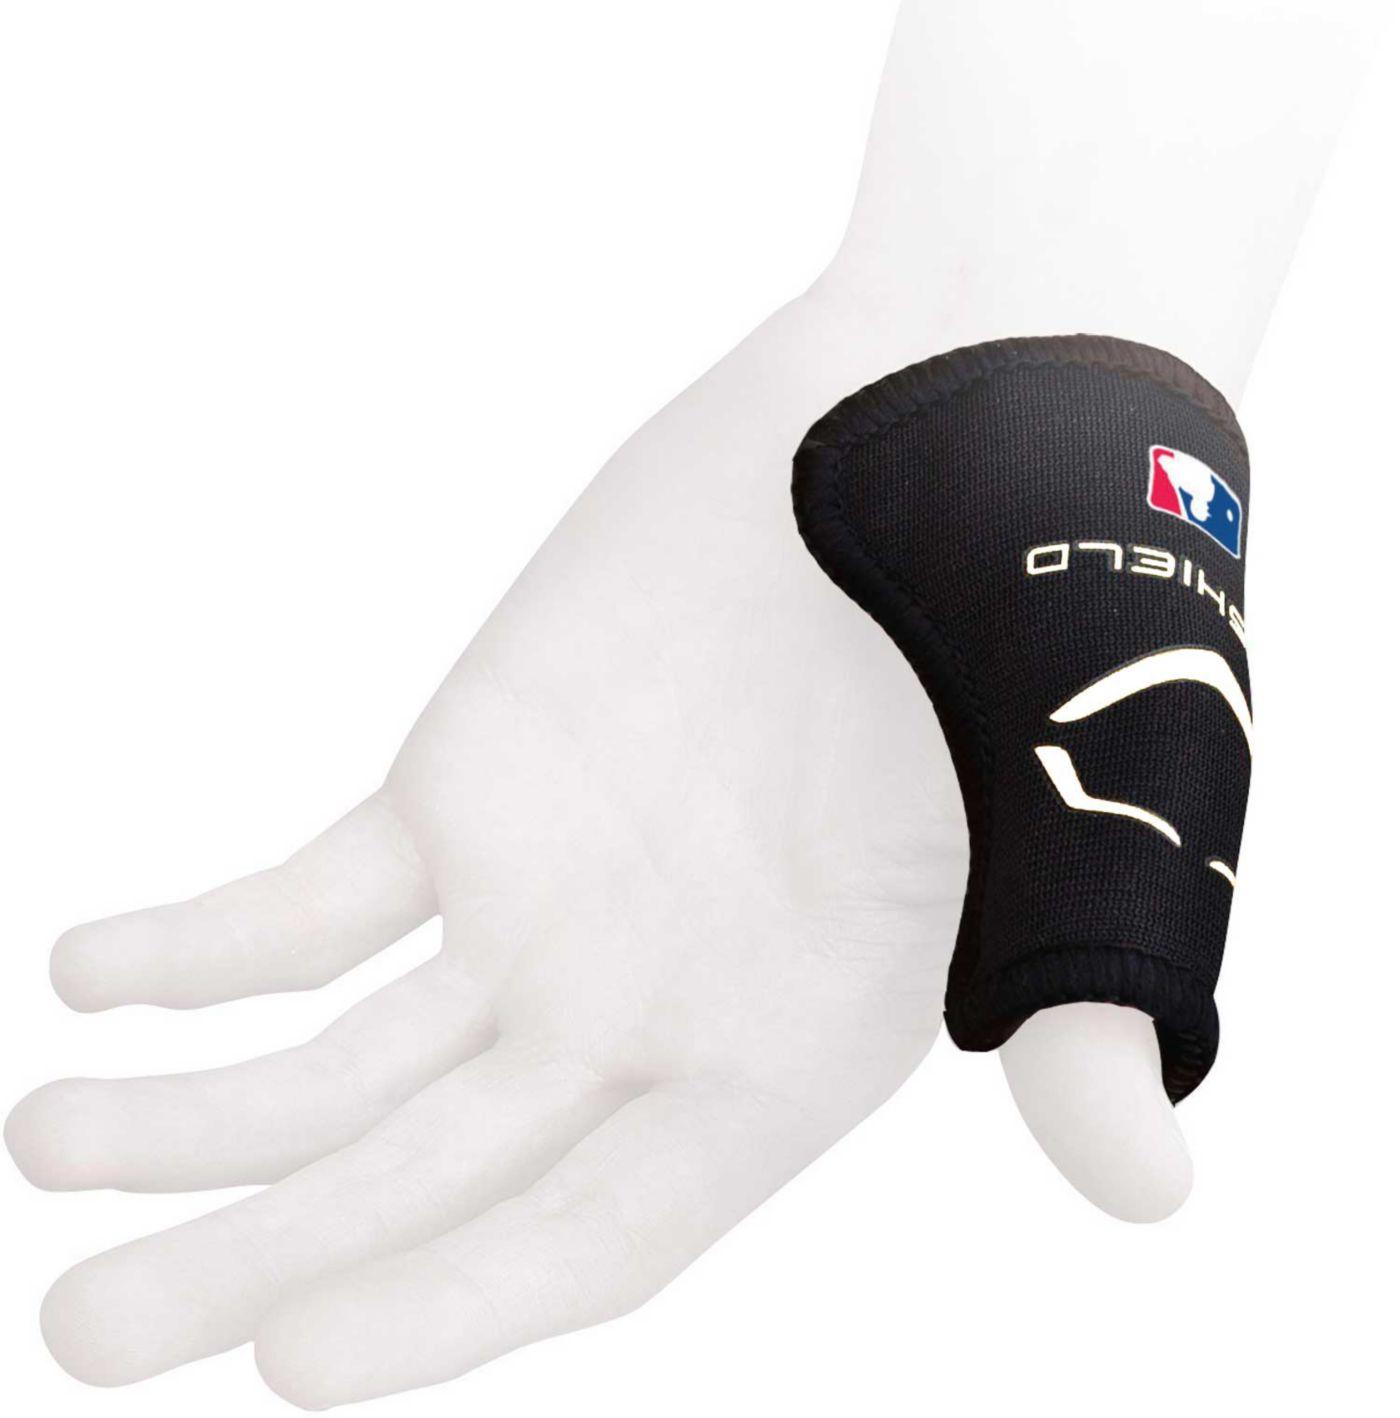 EvoShield Catcher's Thumb Guard